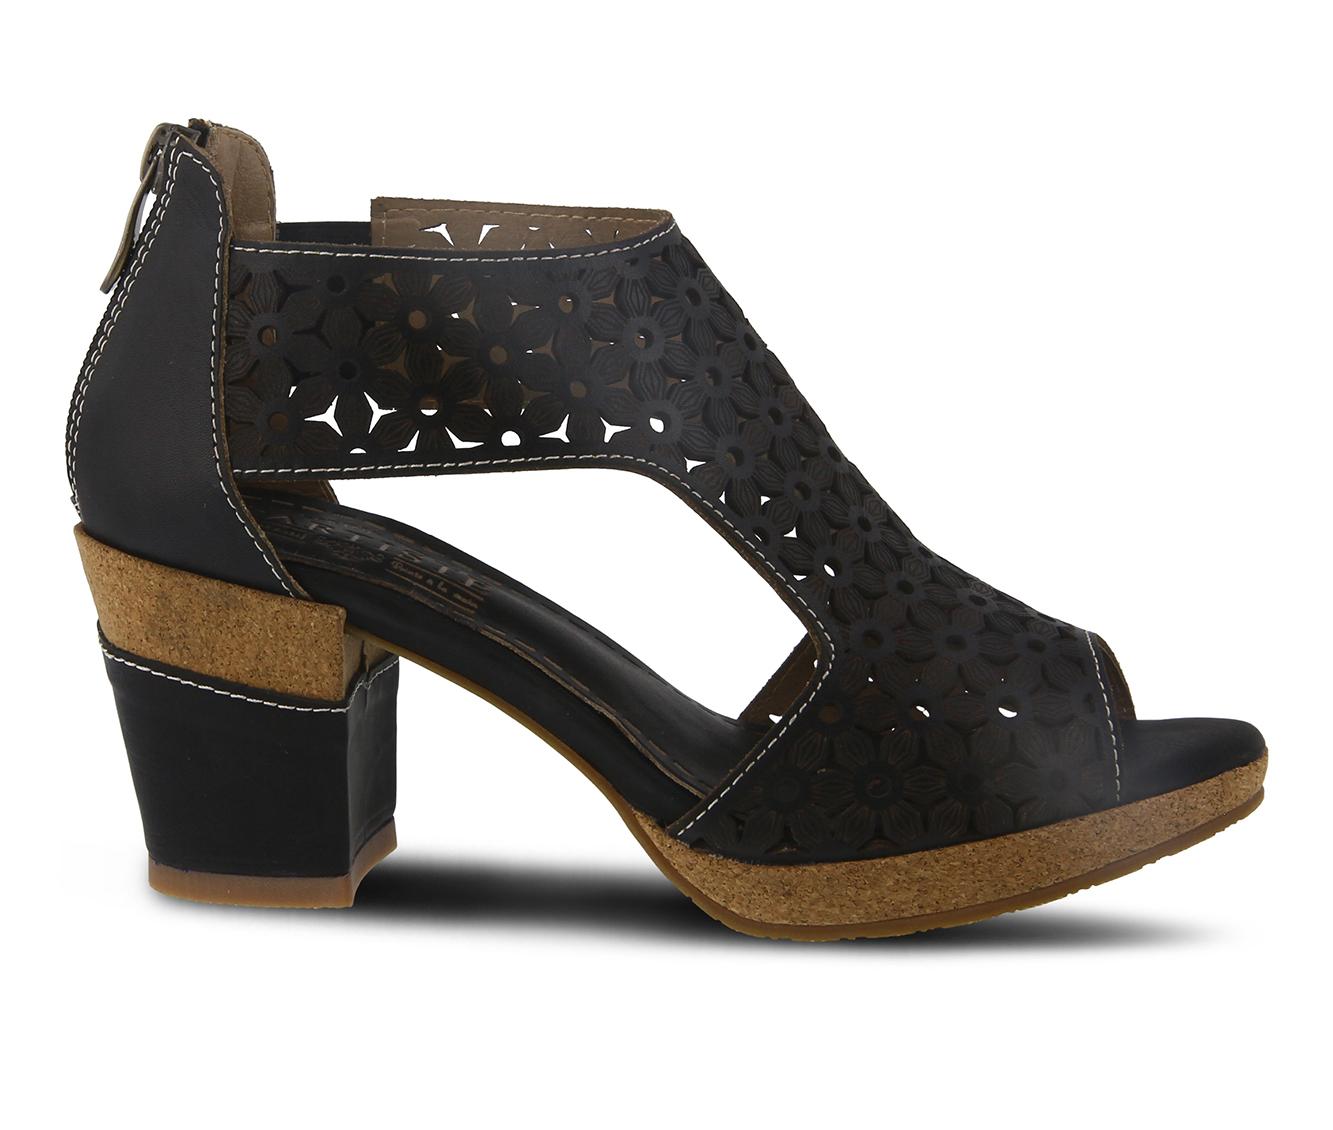 L'Artiste Hibiskus Women's Dress Shoe (Black Leather)